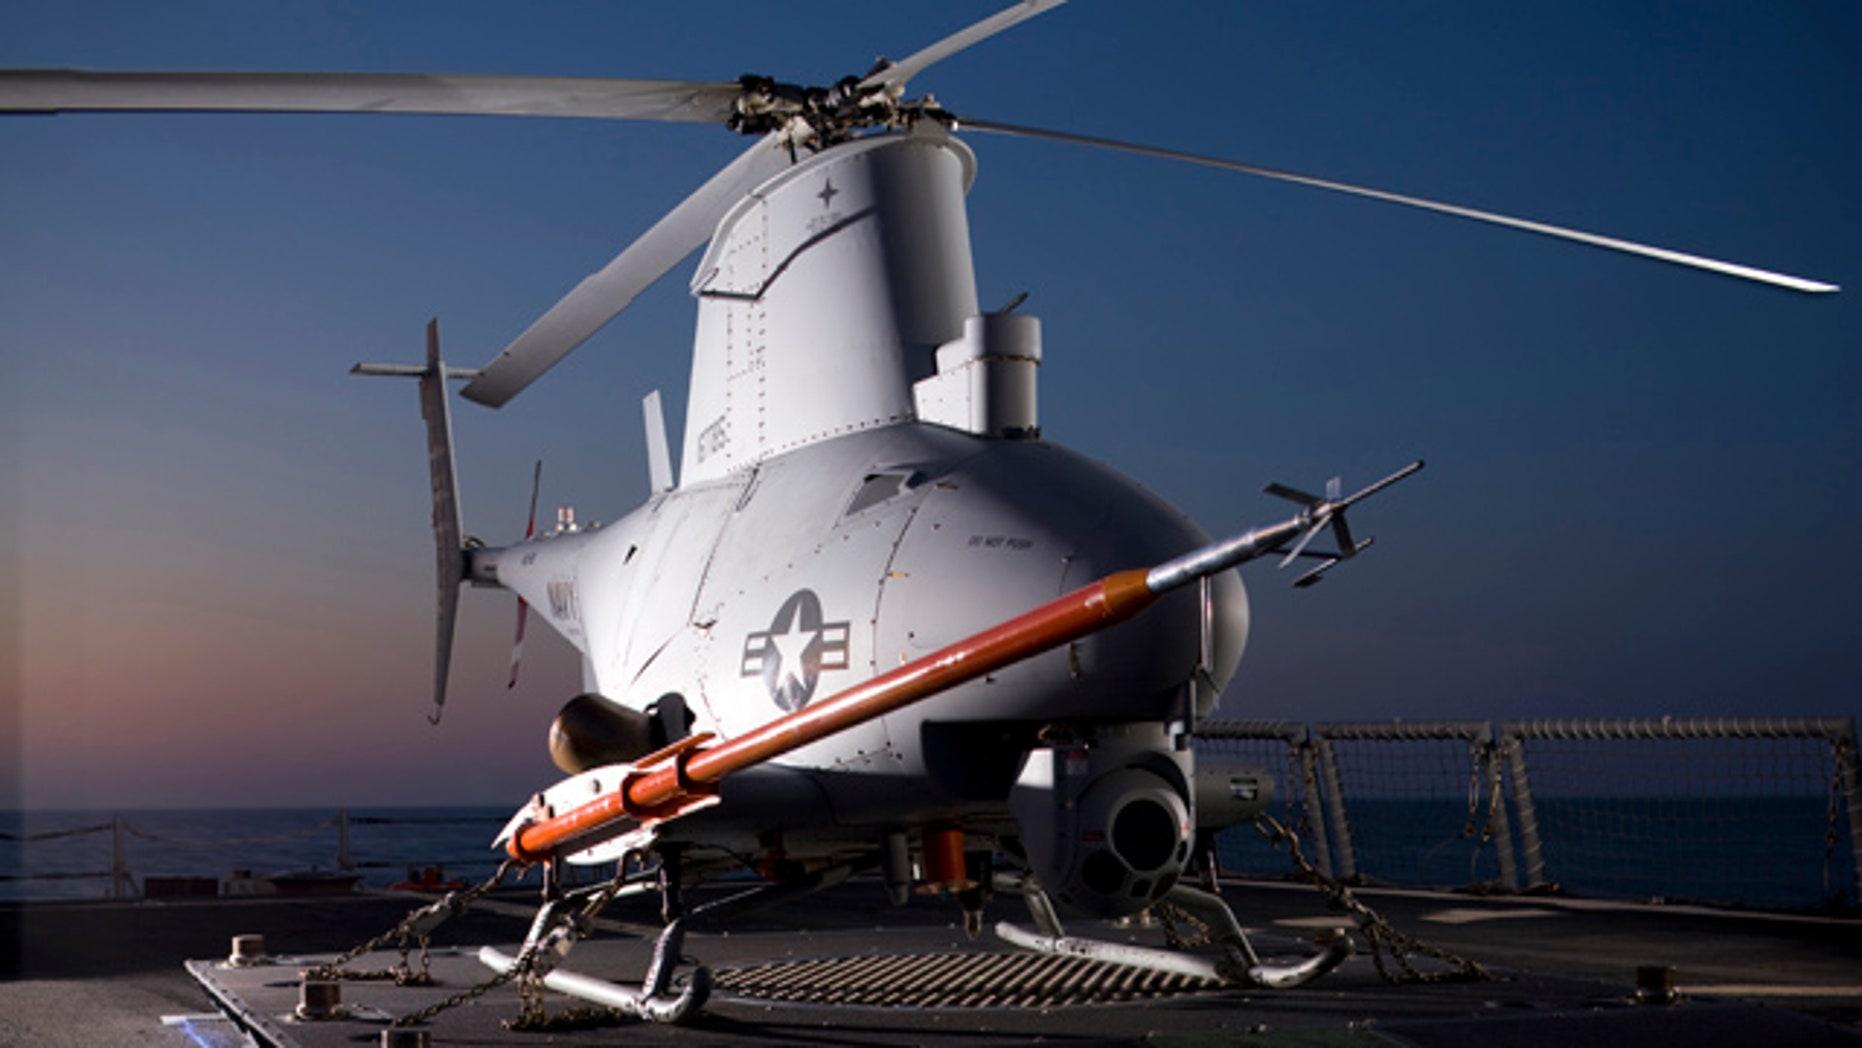 An MQ-8B Fire Scout onboard the USS McInerney.